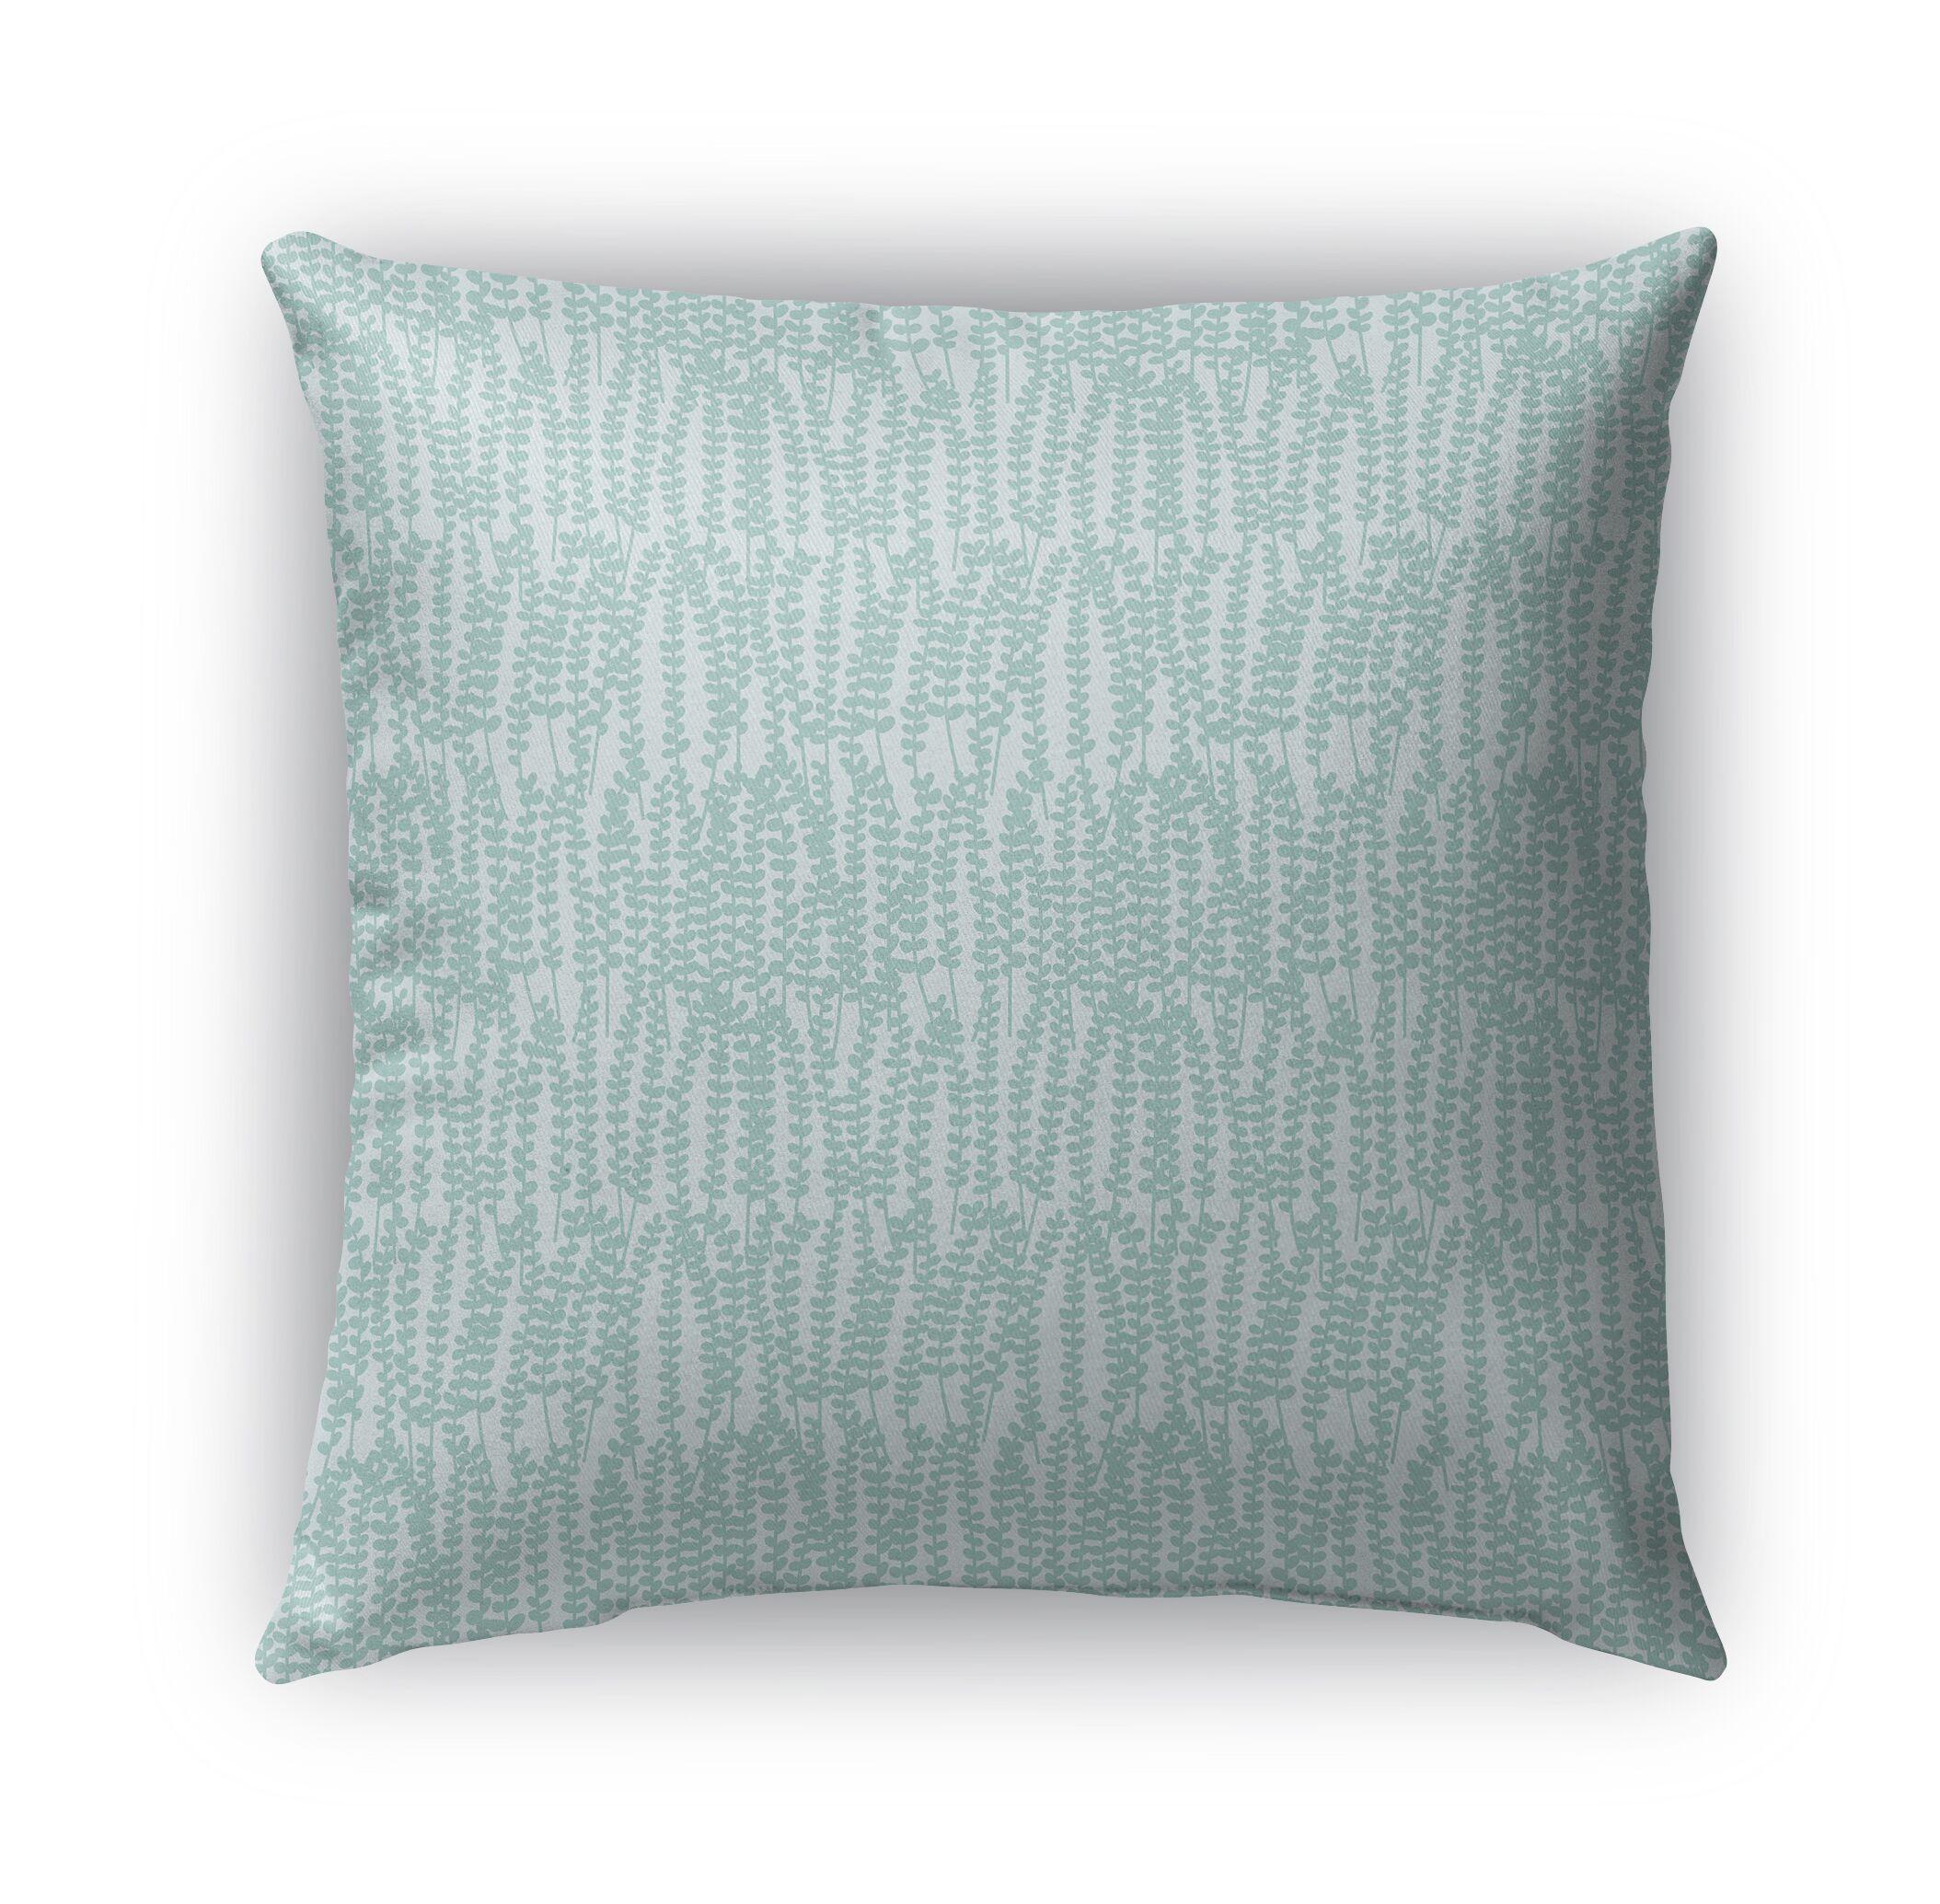 Mangino Indoor/Outdoor Pillow Size: 26